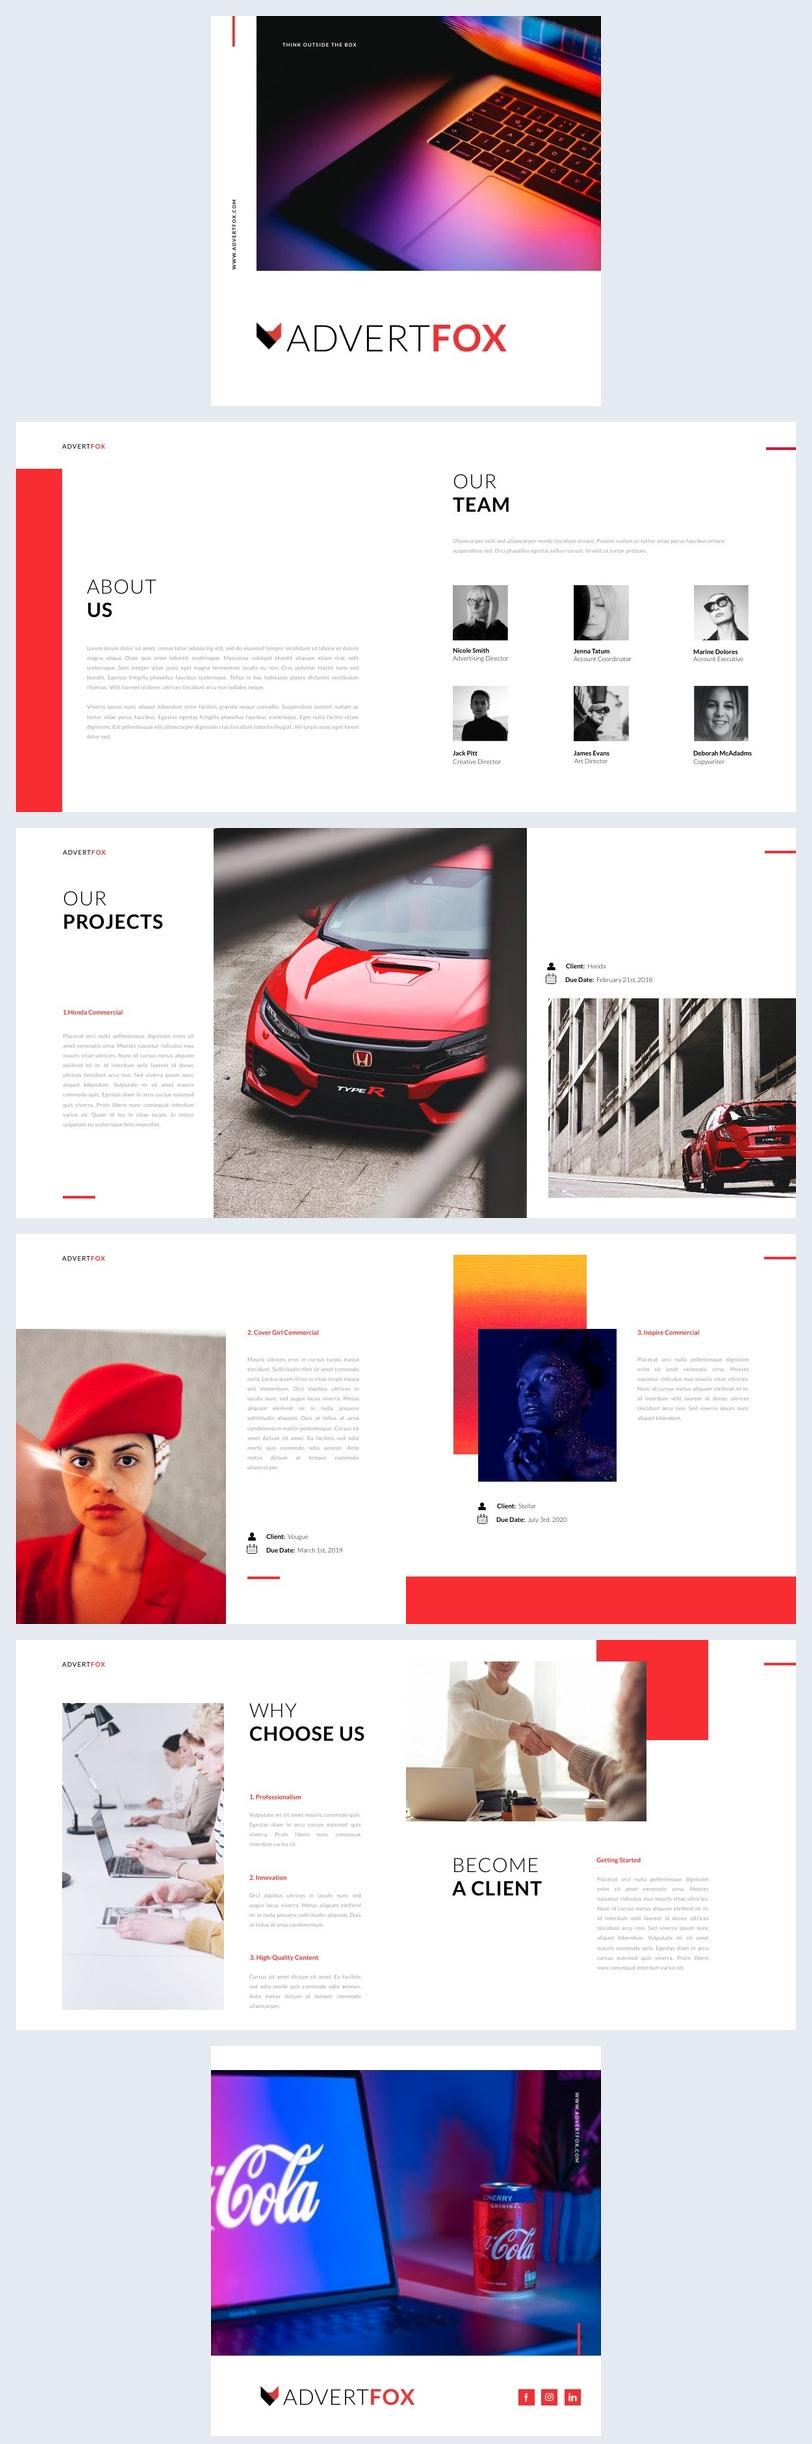 Advertising Flip Book Design Example